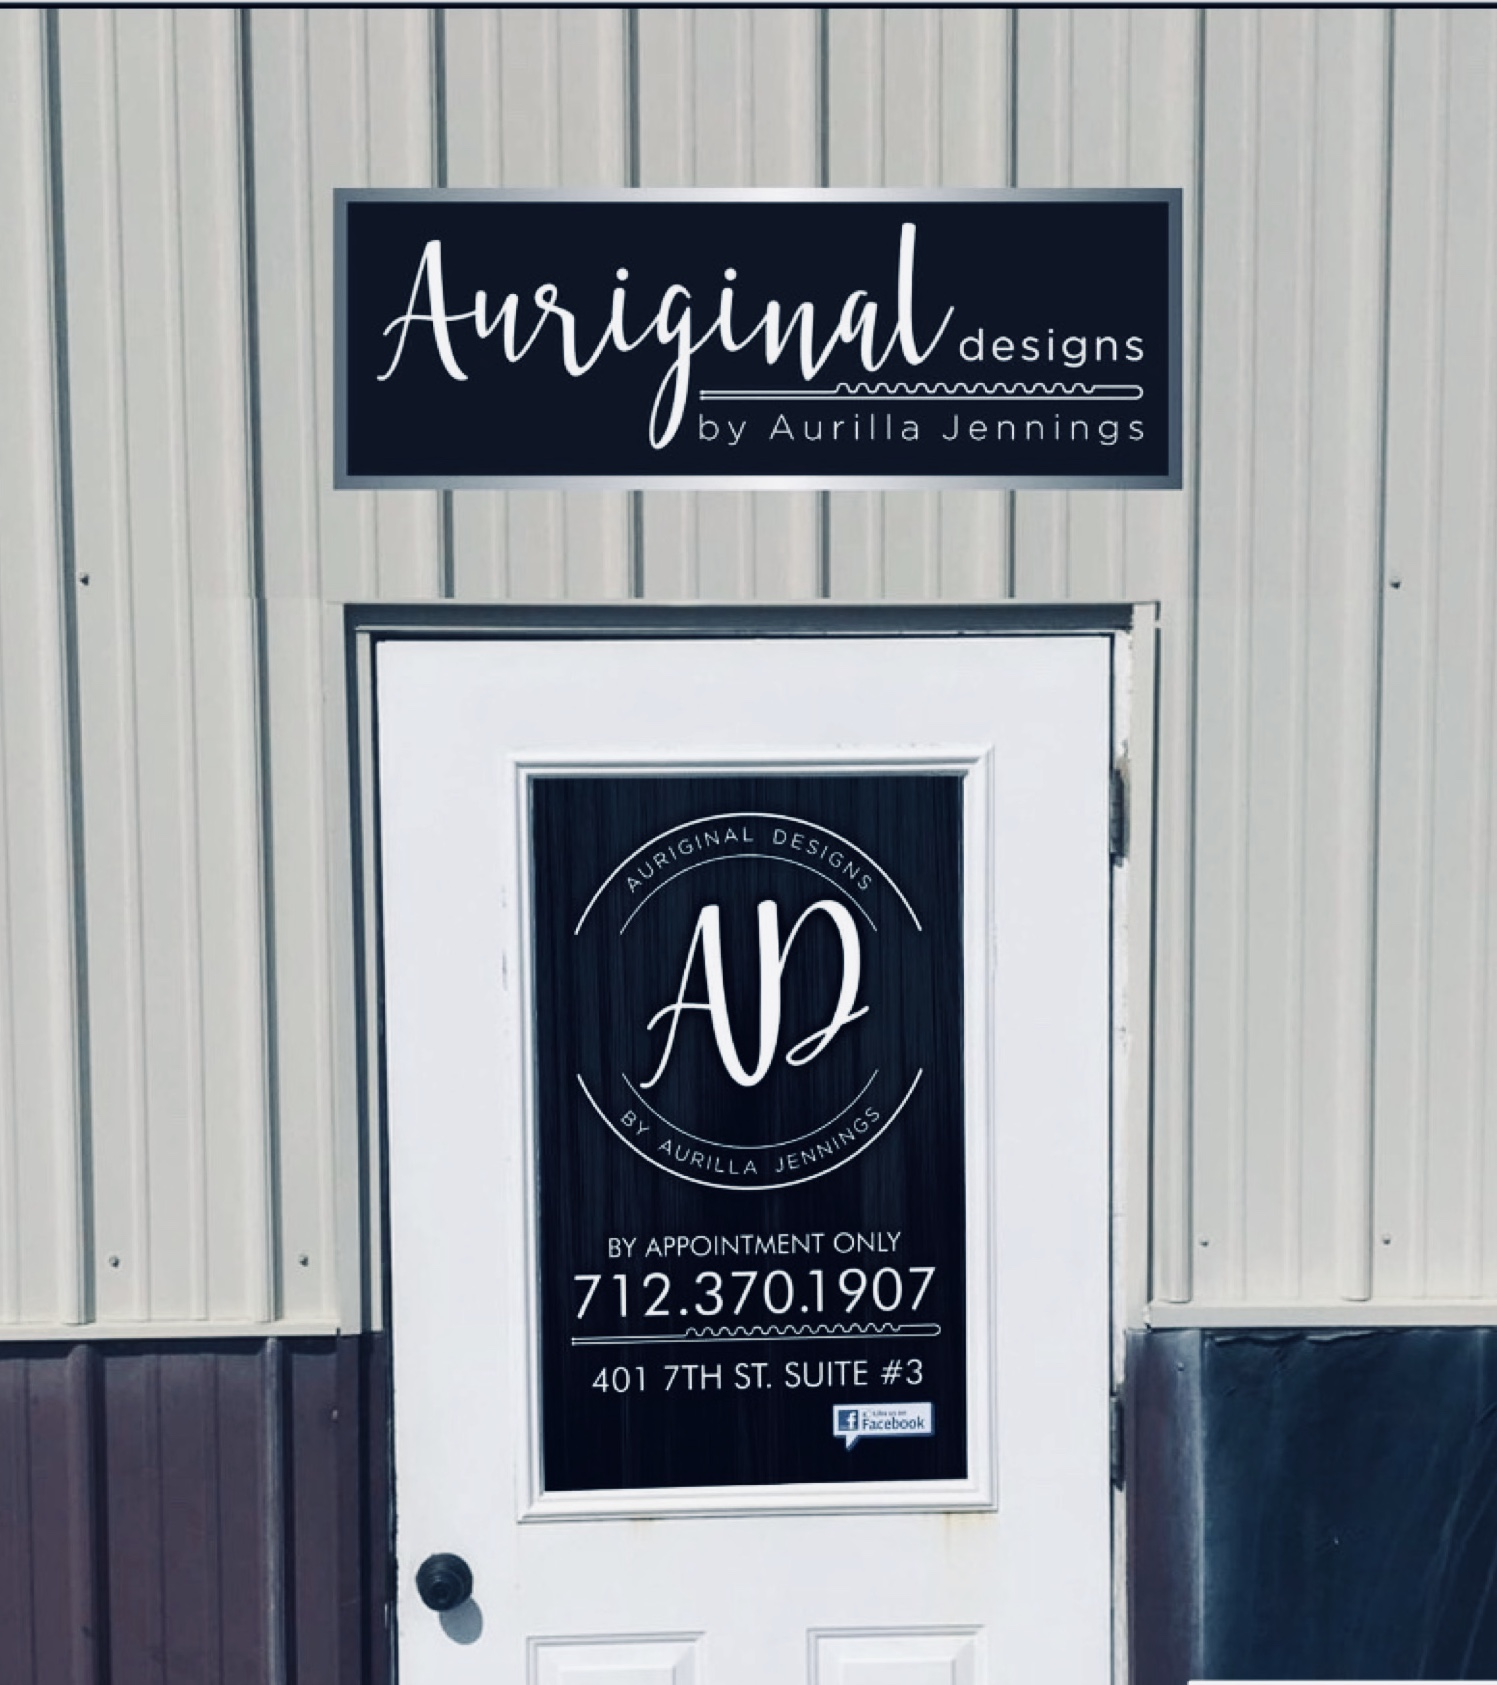 Auriginal Designs.jpg